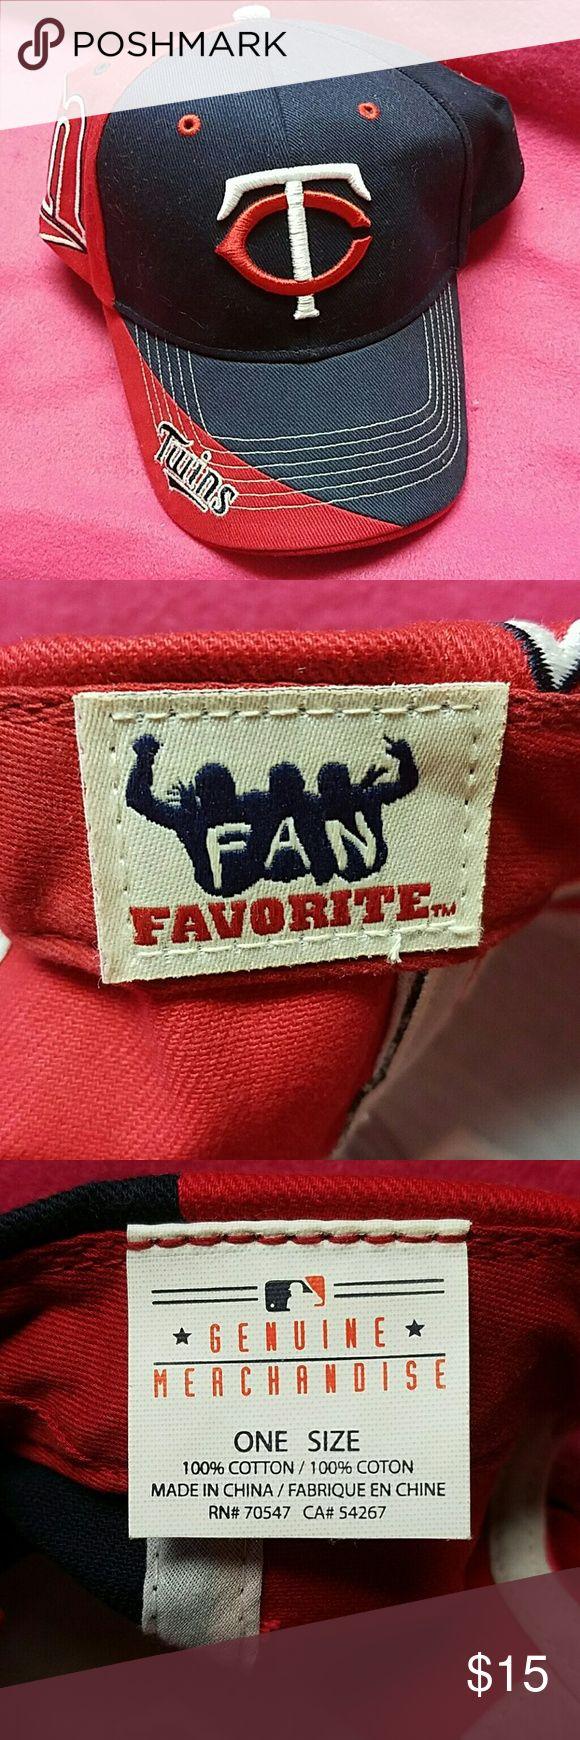 Minn TWINS baseball cap, one size, nwot Minn TWINS fan favorite baseball cap, one size, nwot. The 2017 season is starting...a must have. mlb Accessories Hats